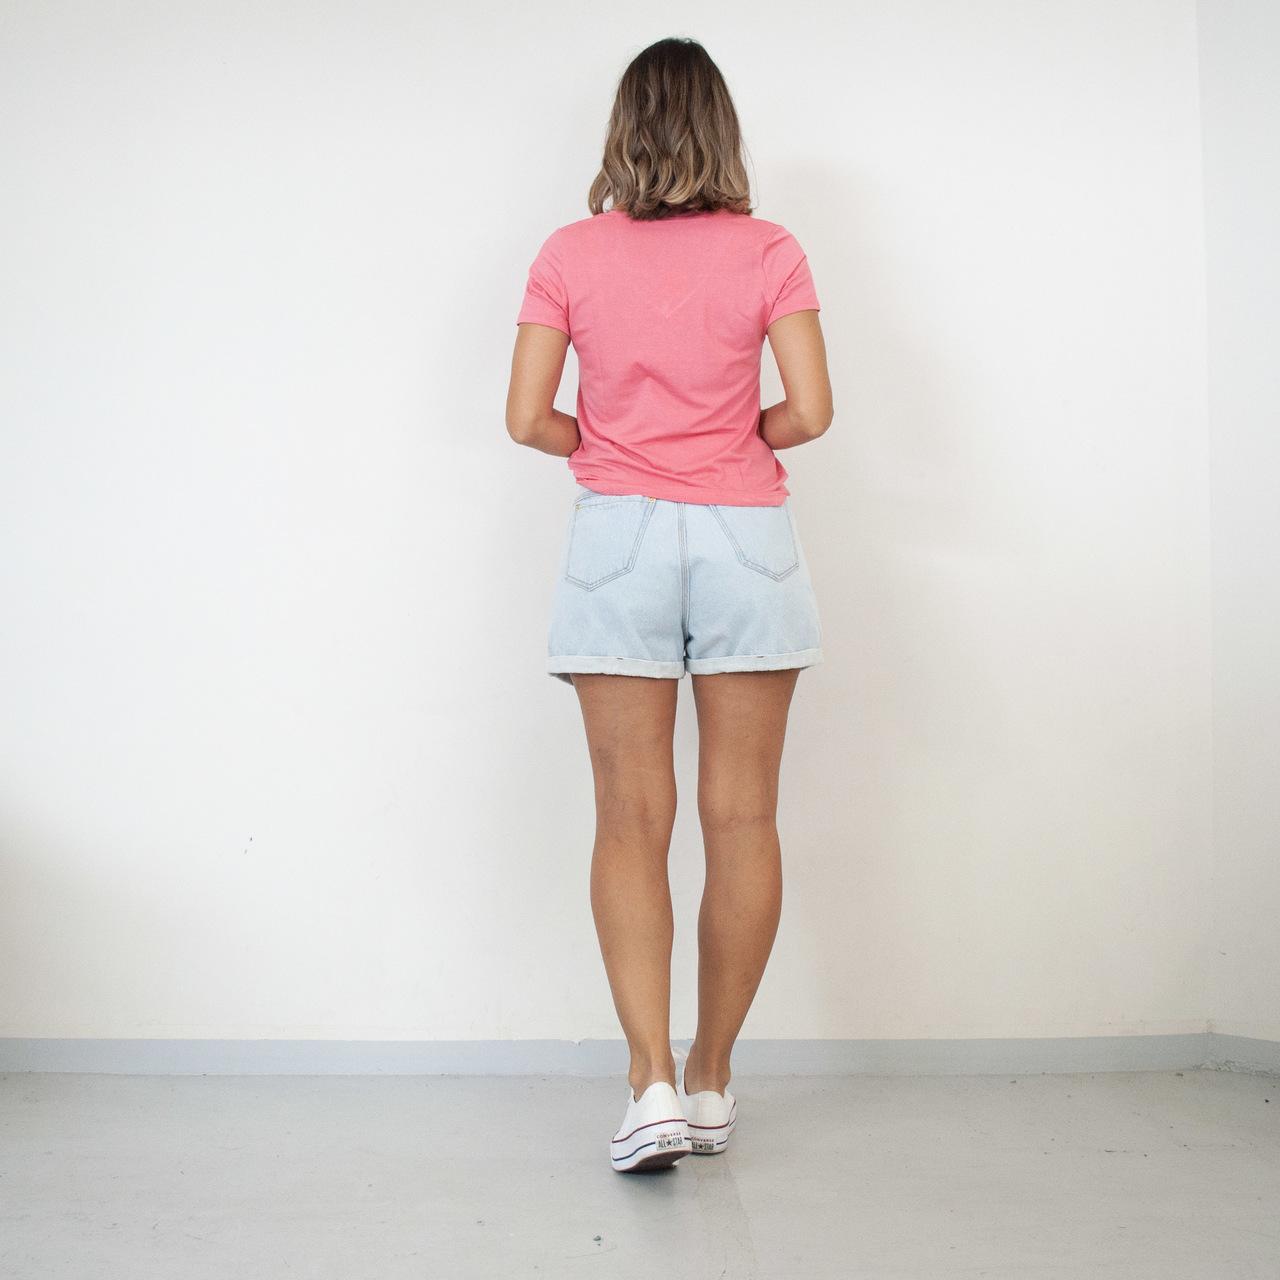 T-Shirt Viscolycra Gola V - All We Need - Rosê